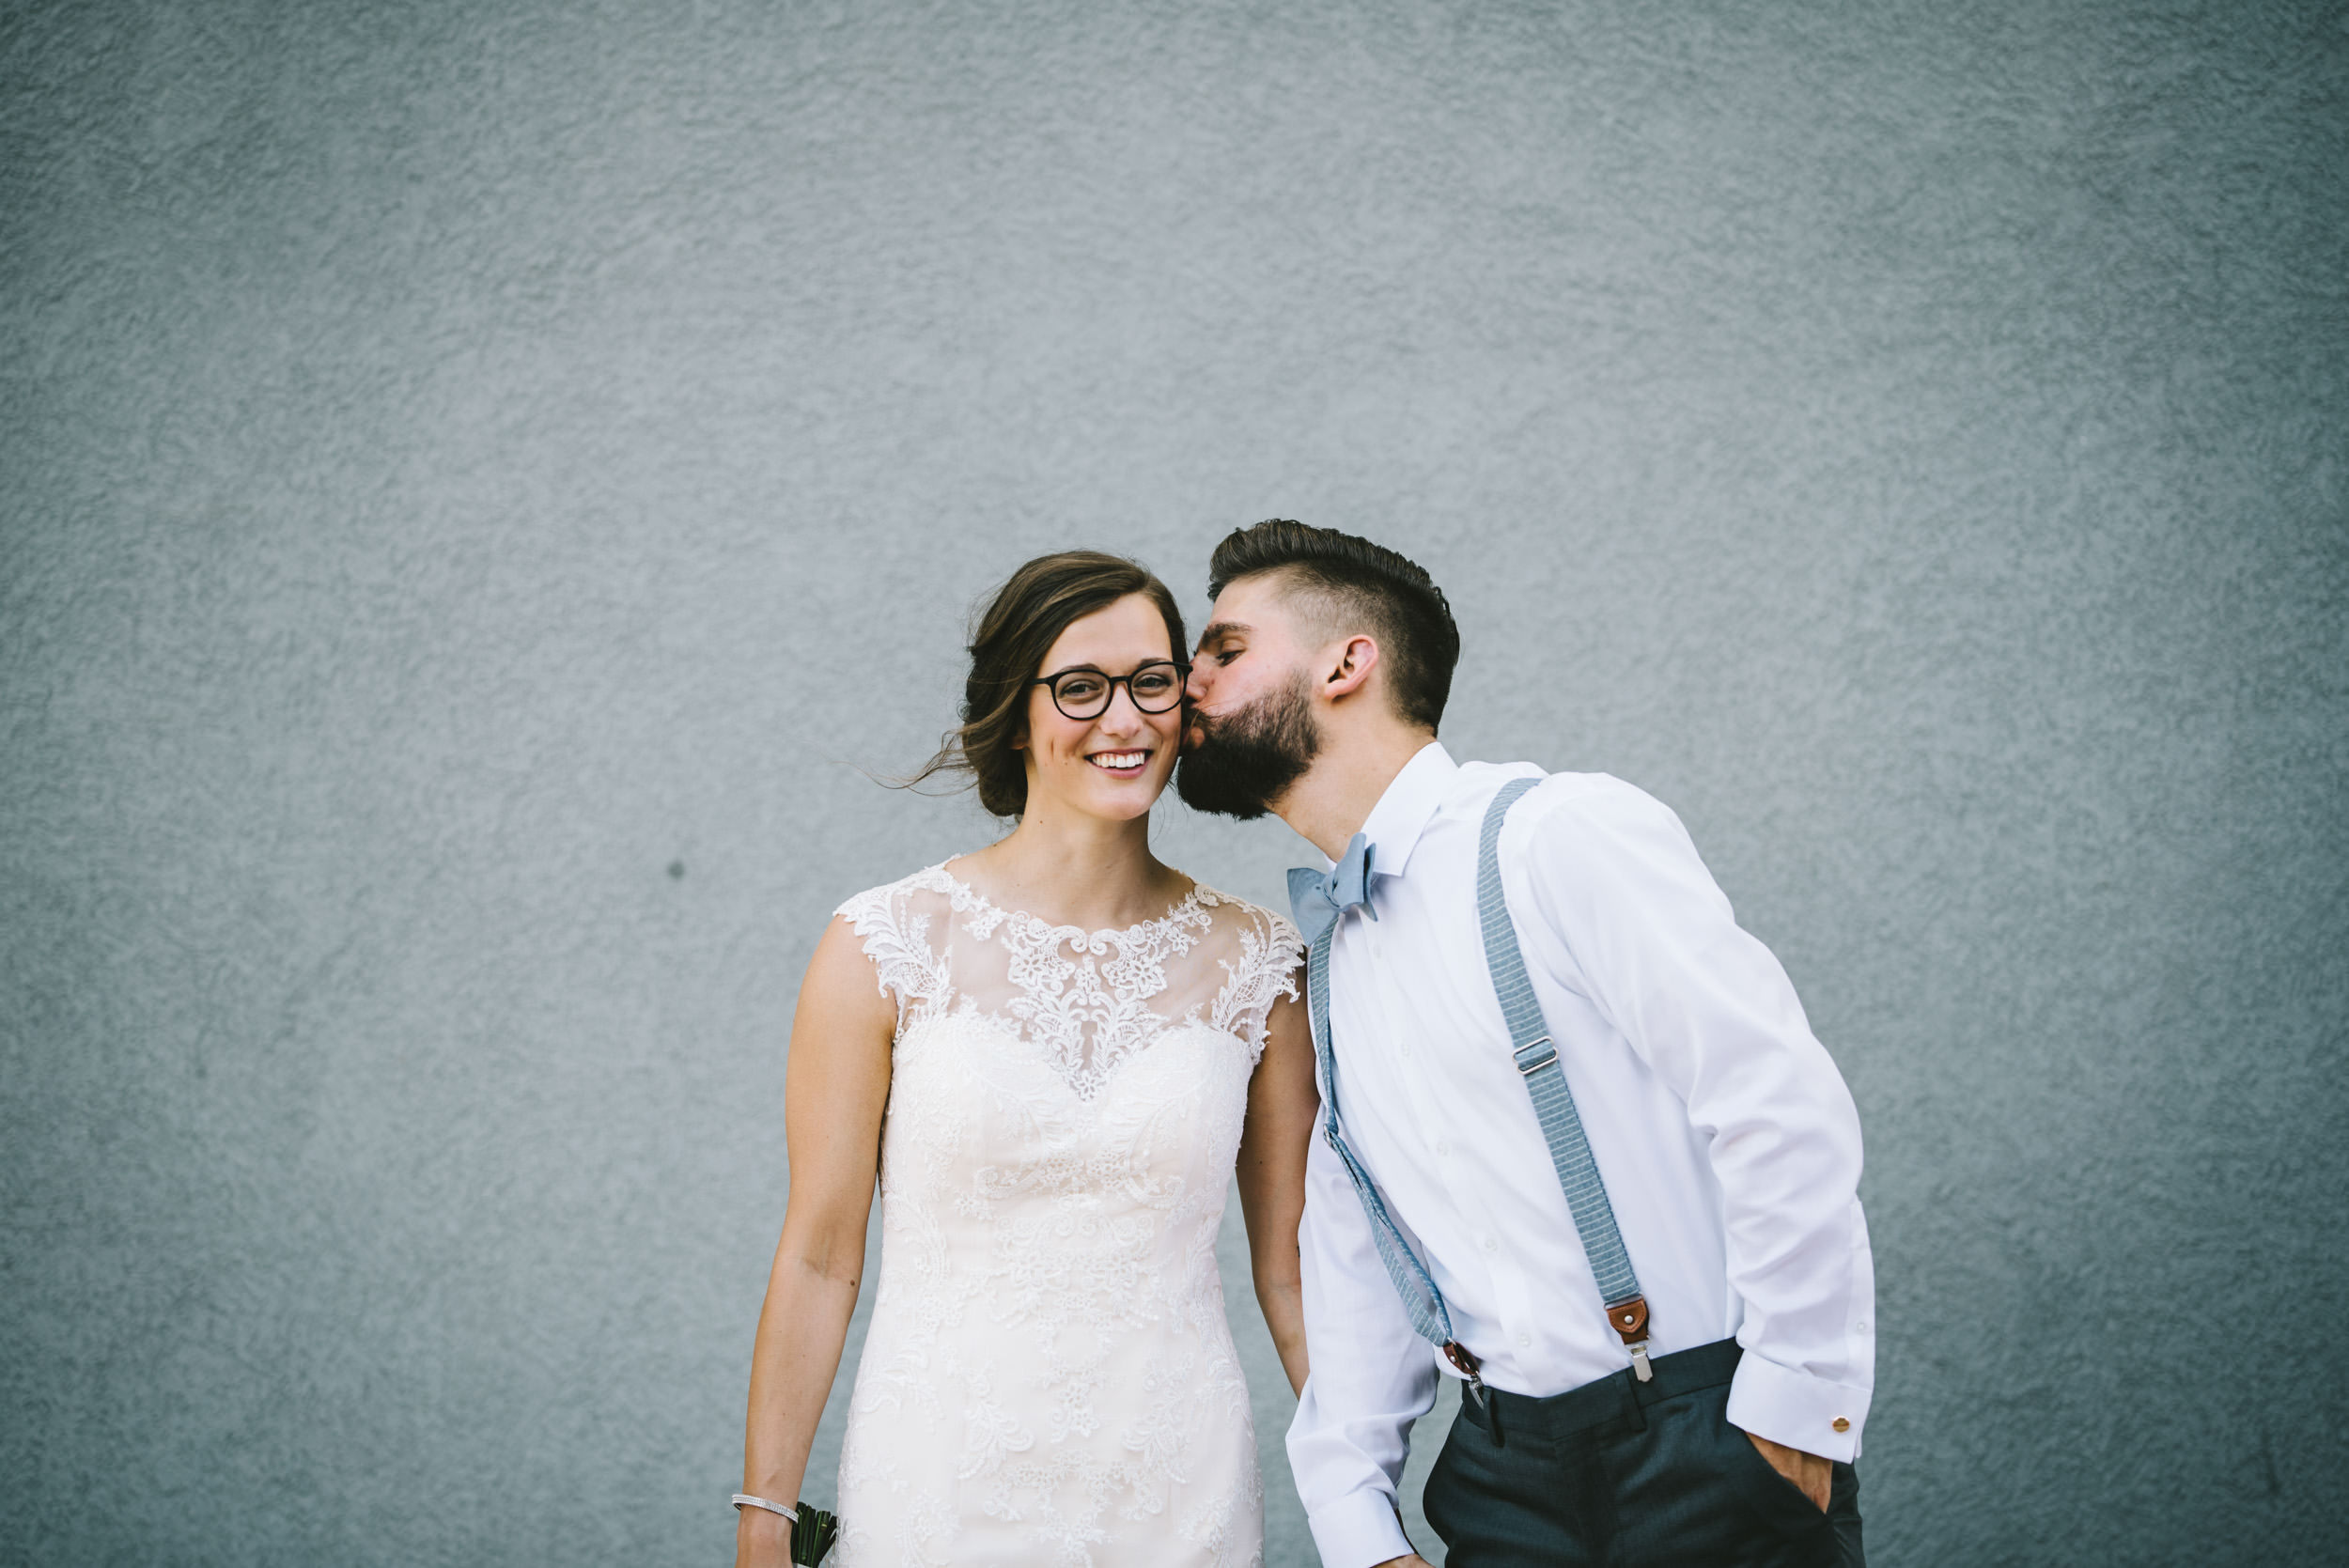 wedding-maggie-lachlan-902.jpg